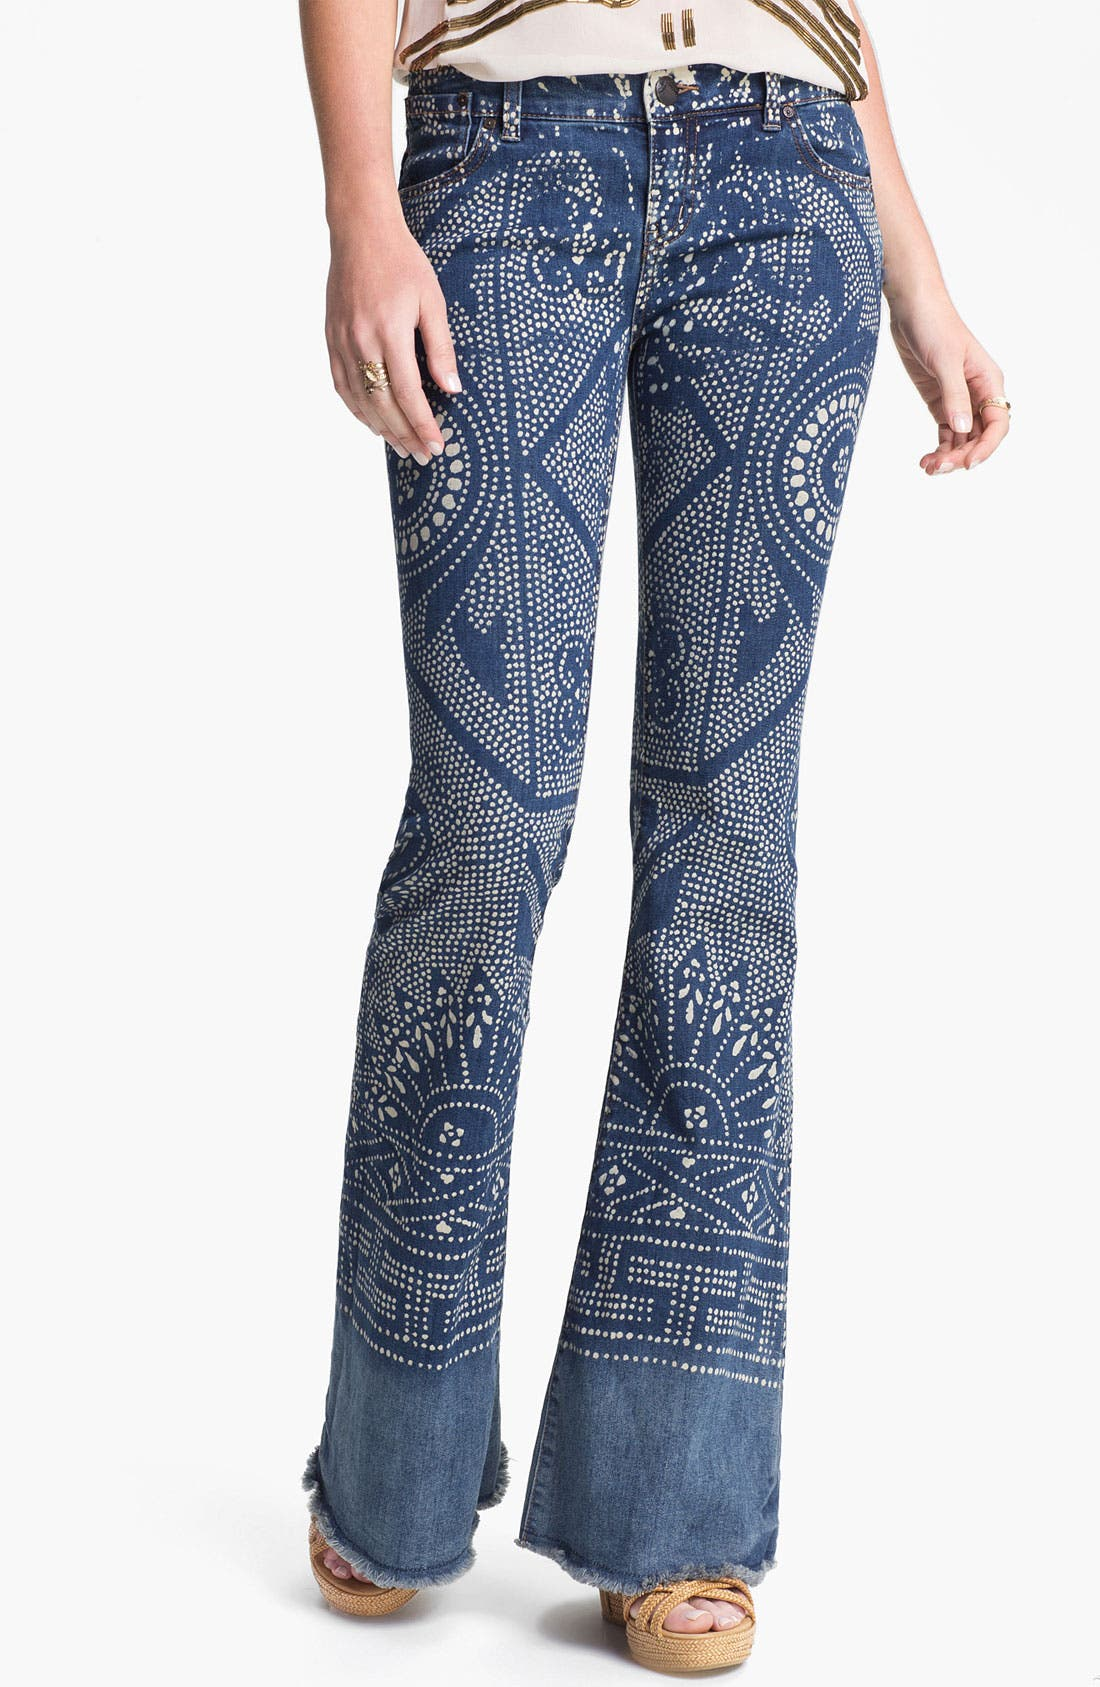 Main Image - Free People 'Bali' Print Flare Leg Jeans (Malaya)